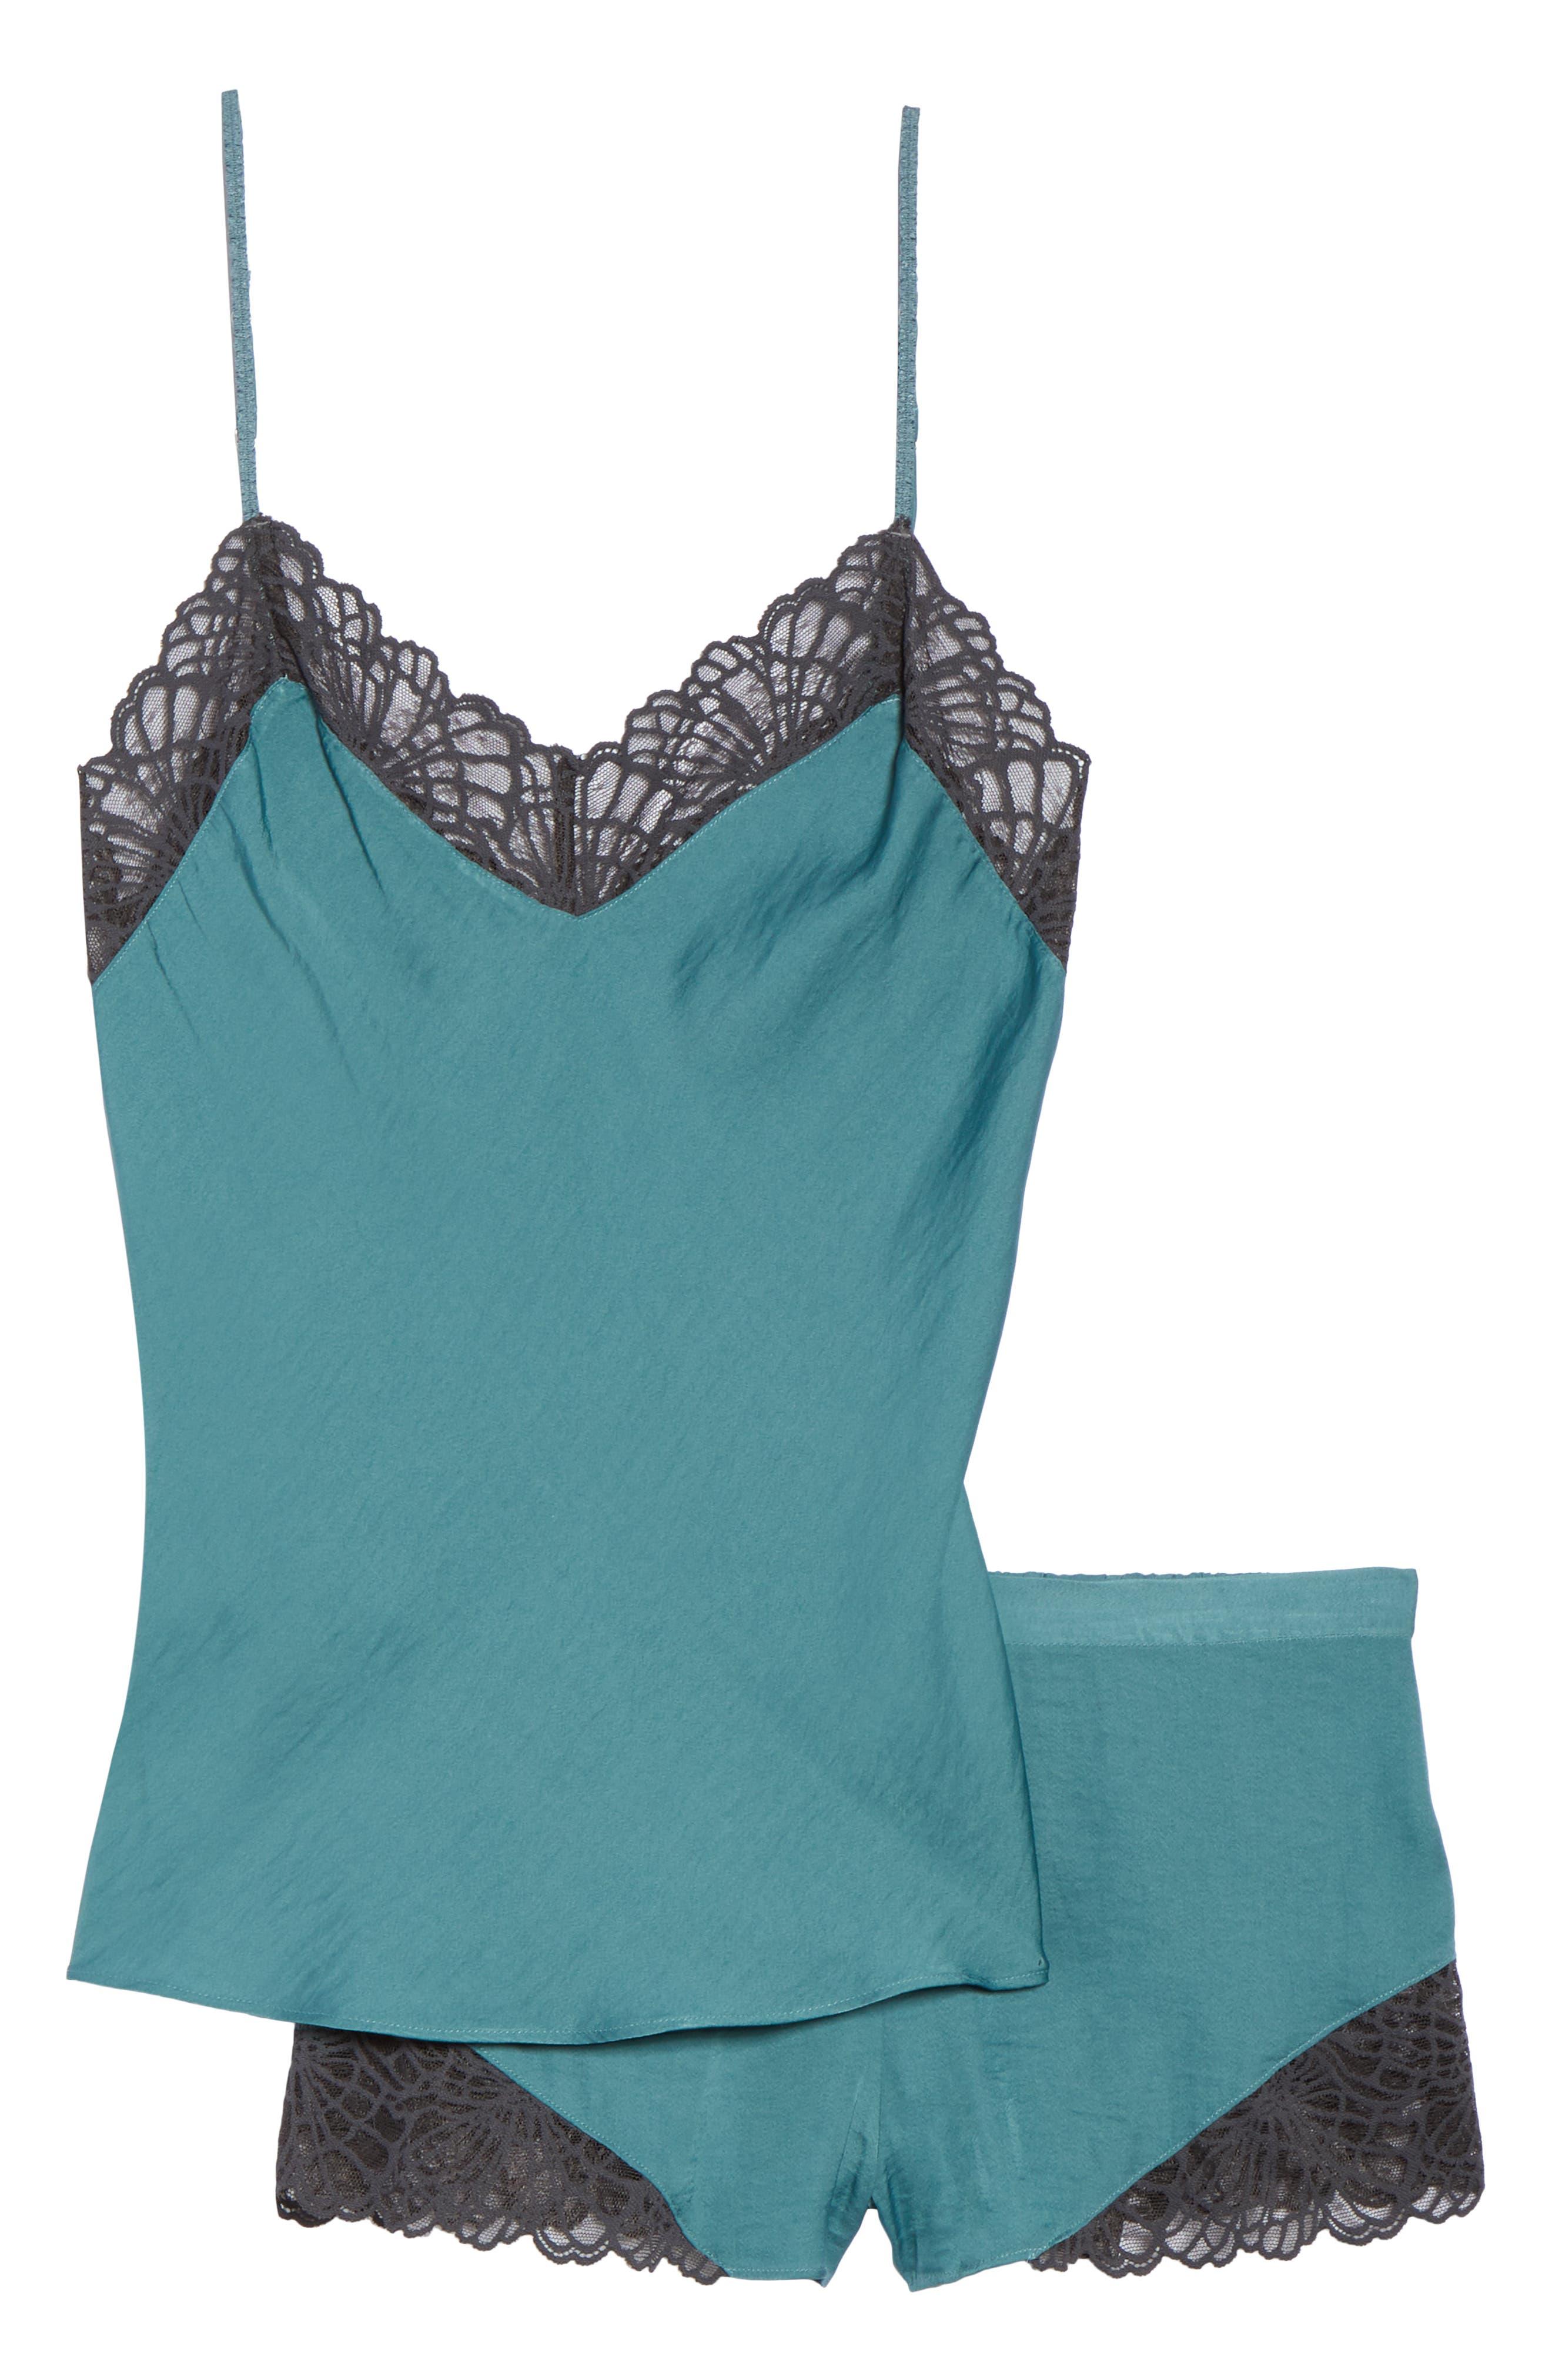 Colette Camisole & Short Pajamas,                             Alternate thumbnail 6, color,                             DUSTY JADE